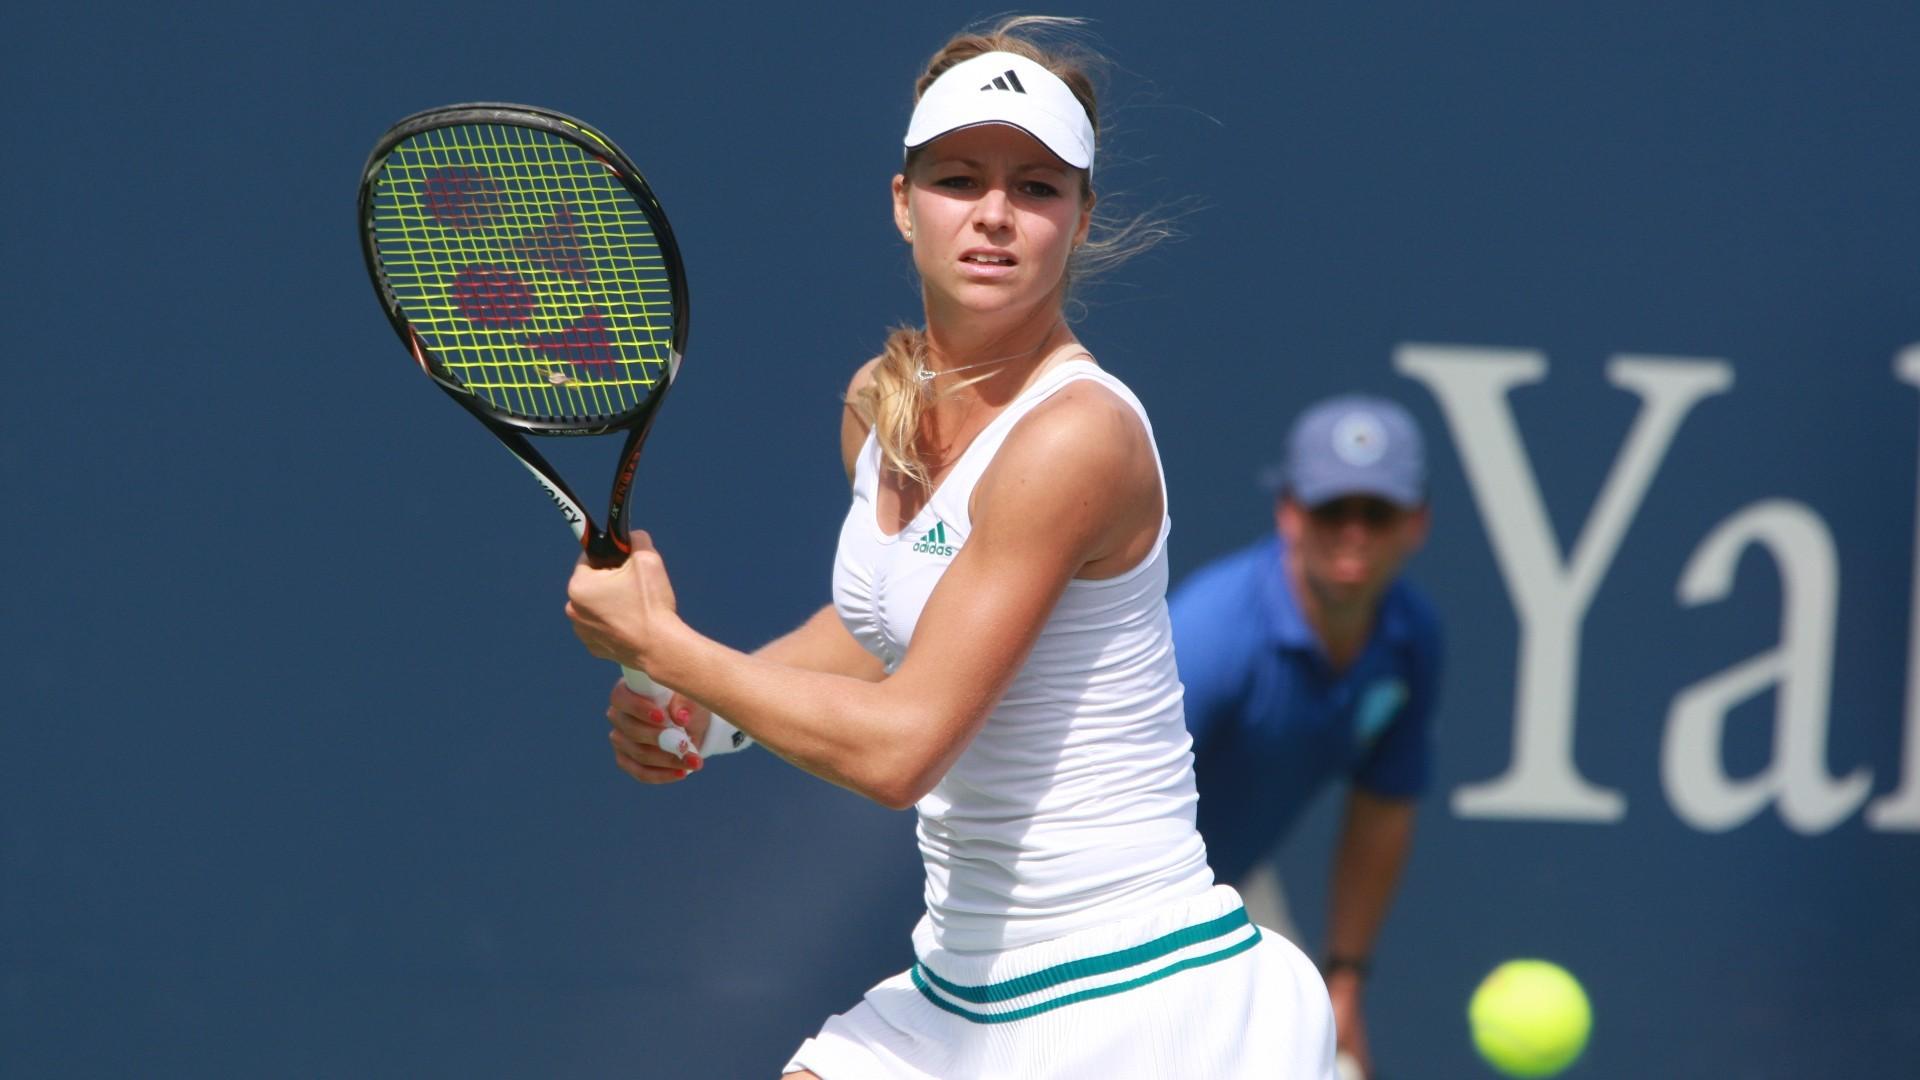 Wallpaper : Women, Maria Kirilenko, Tournament, Tennis